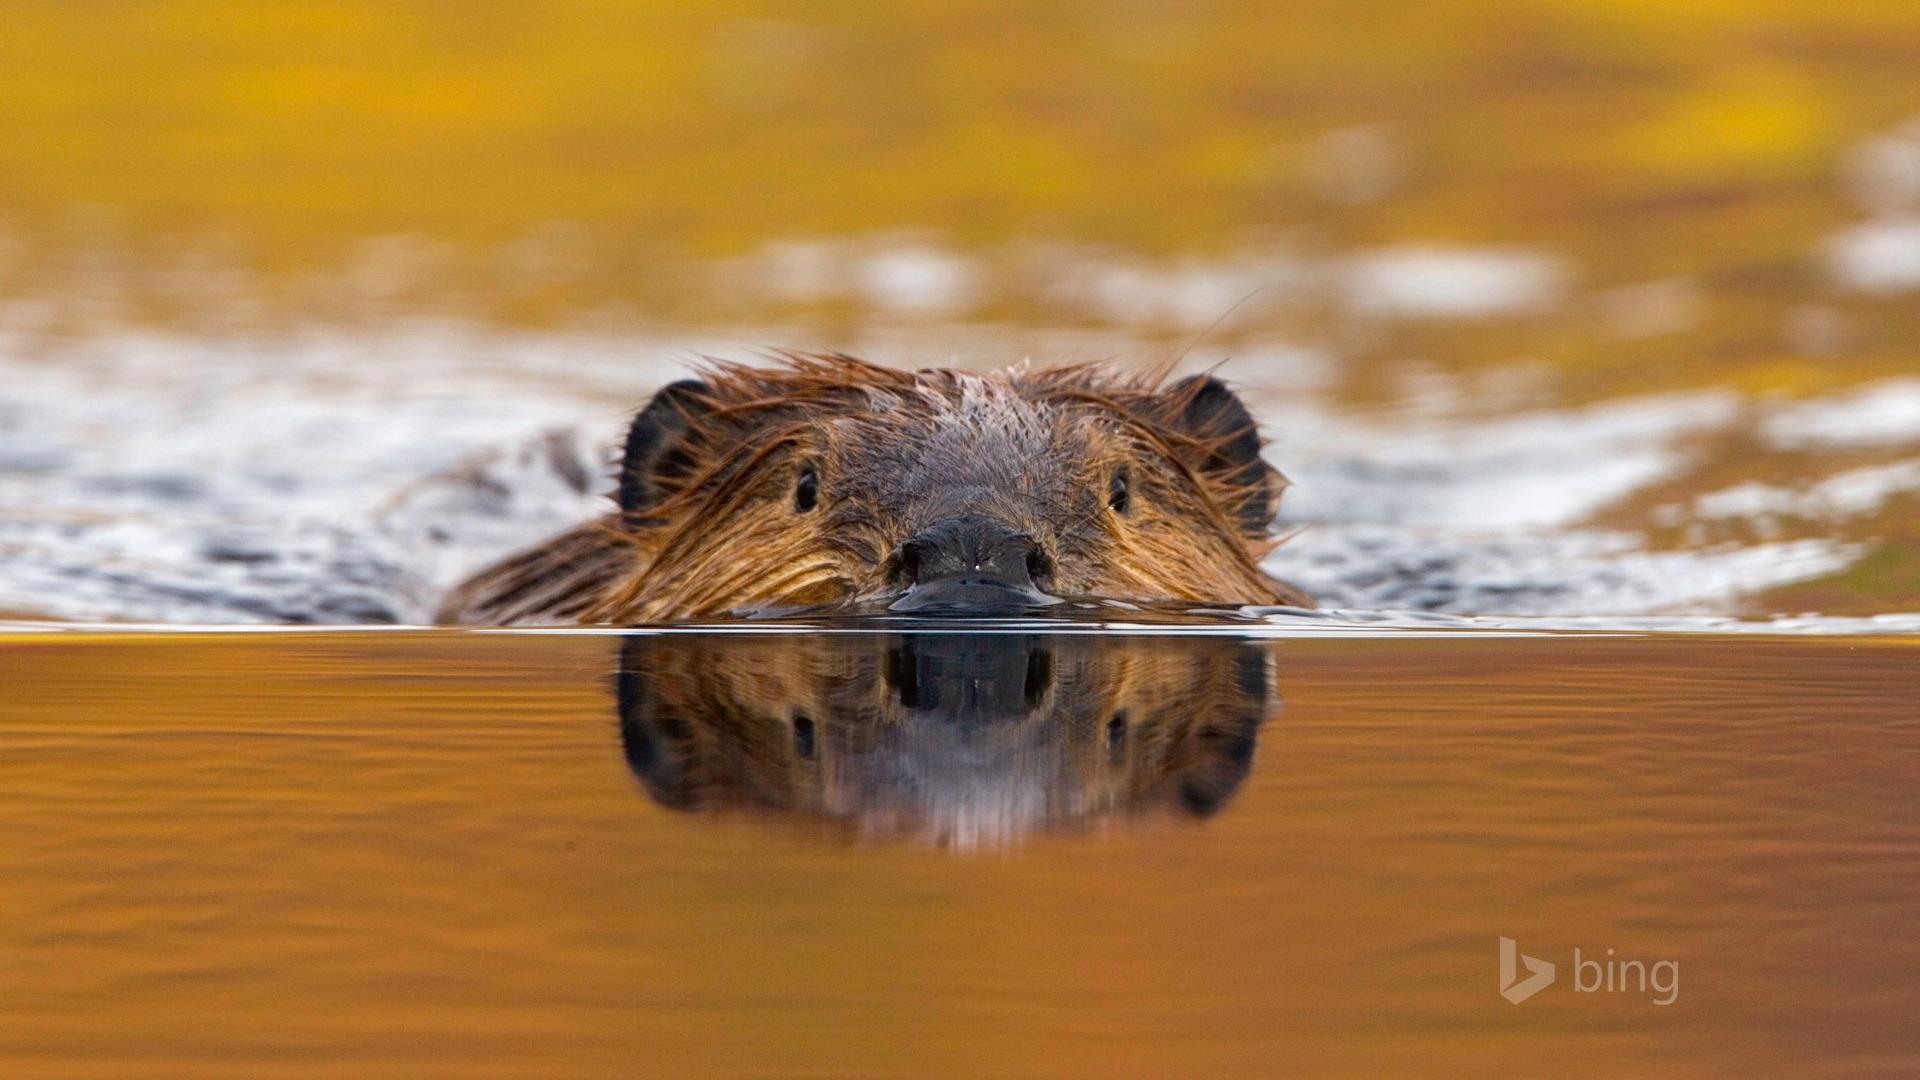 bing animals swimming theme beaver 10wallpaper wallpapers north popular shot resolution